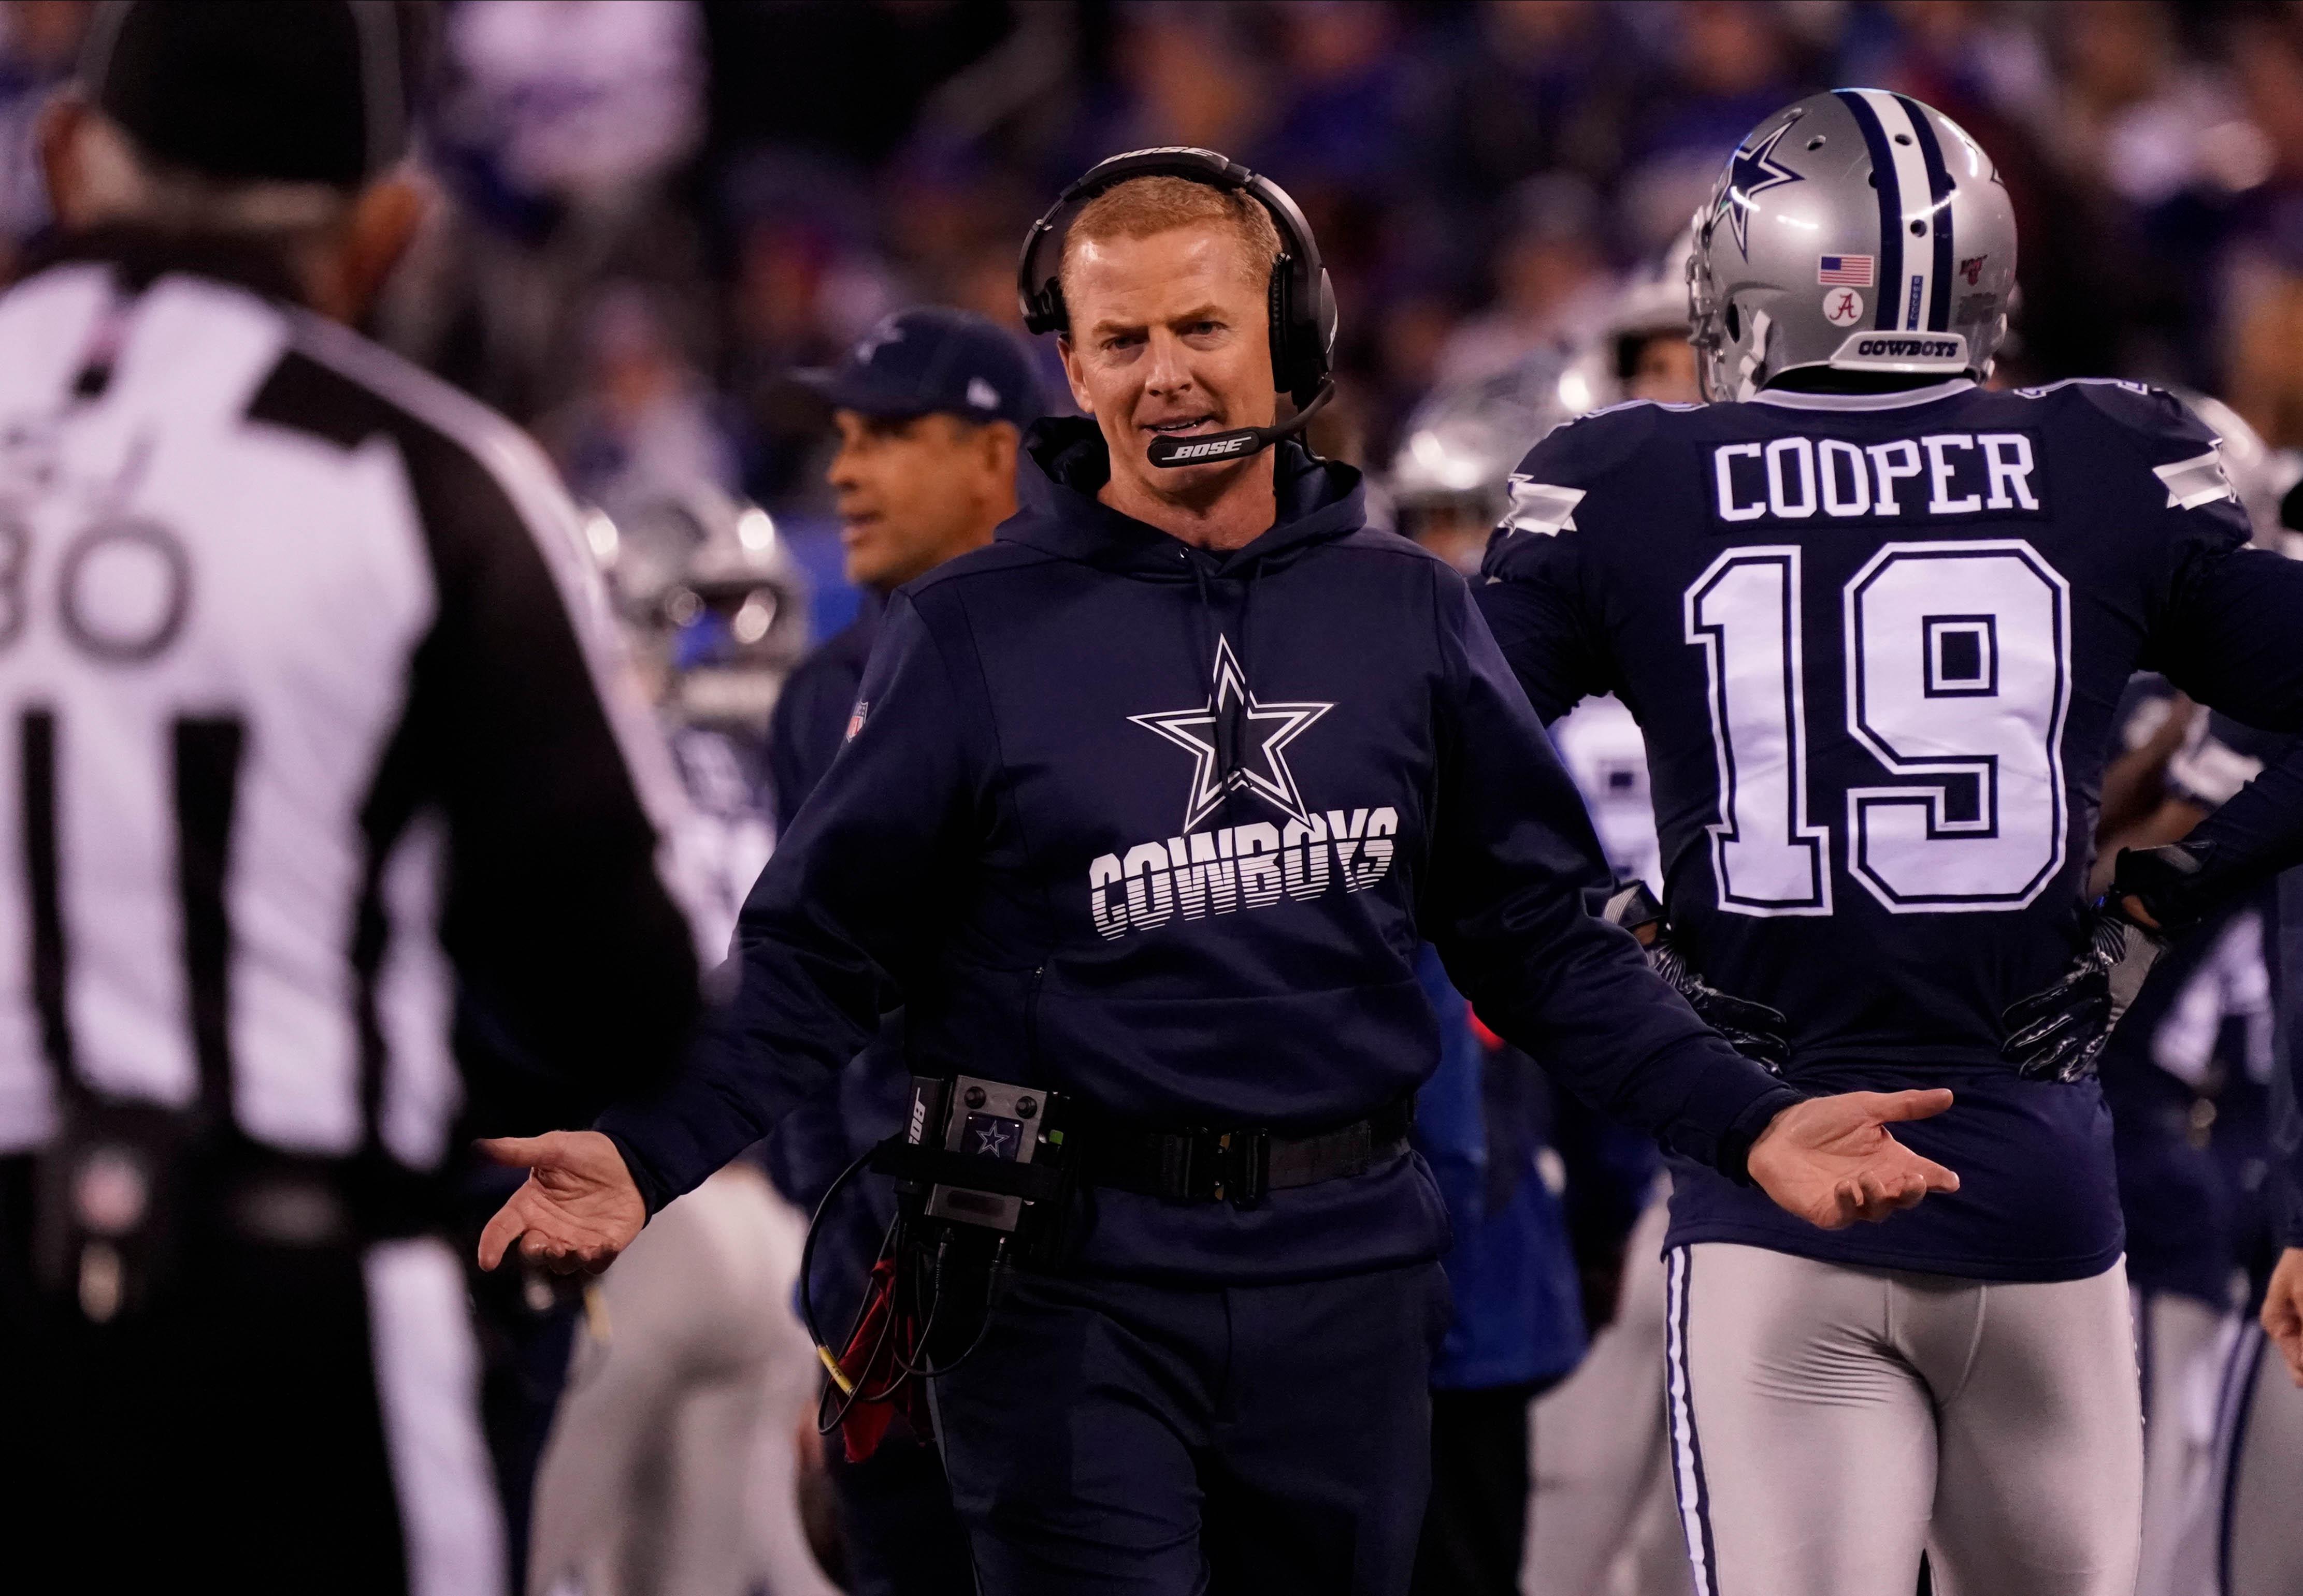 Cowboys rumors indicate Jason Garrett must make playoffs, more to save job